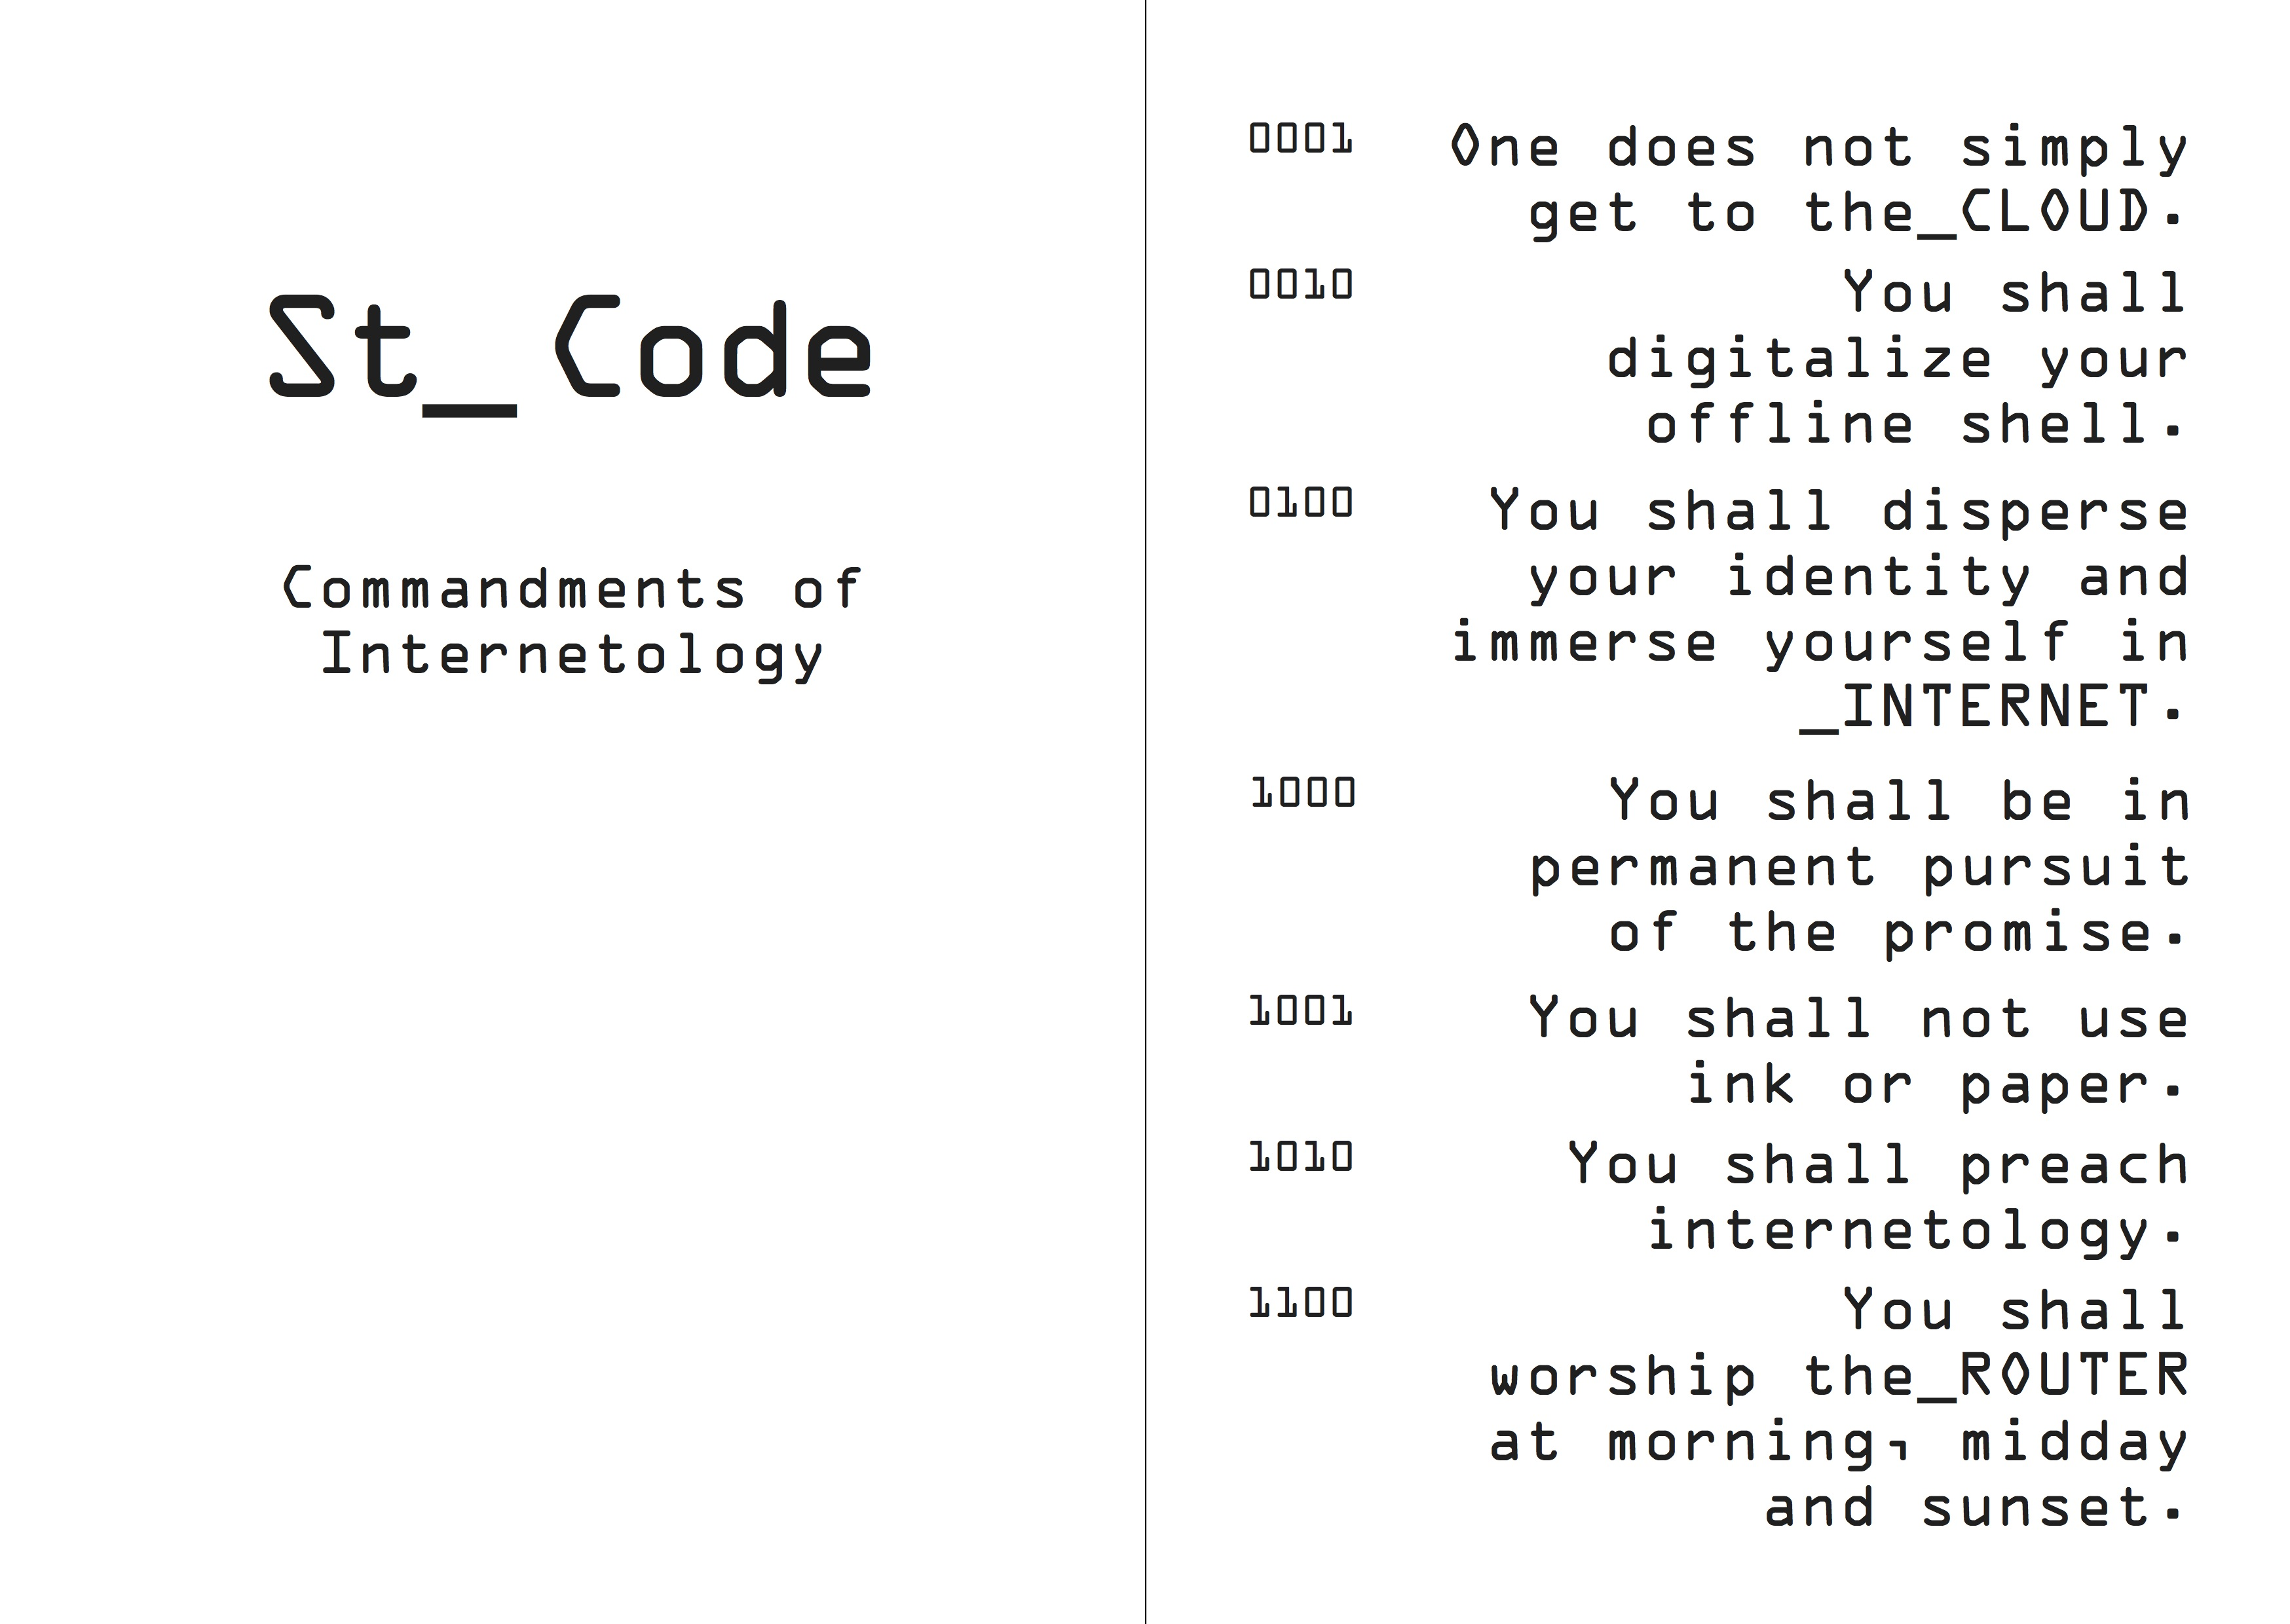 Sct_Code 3